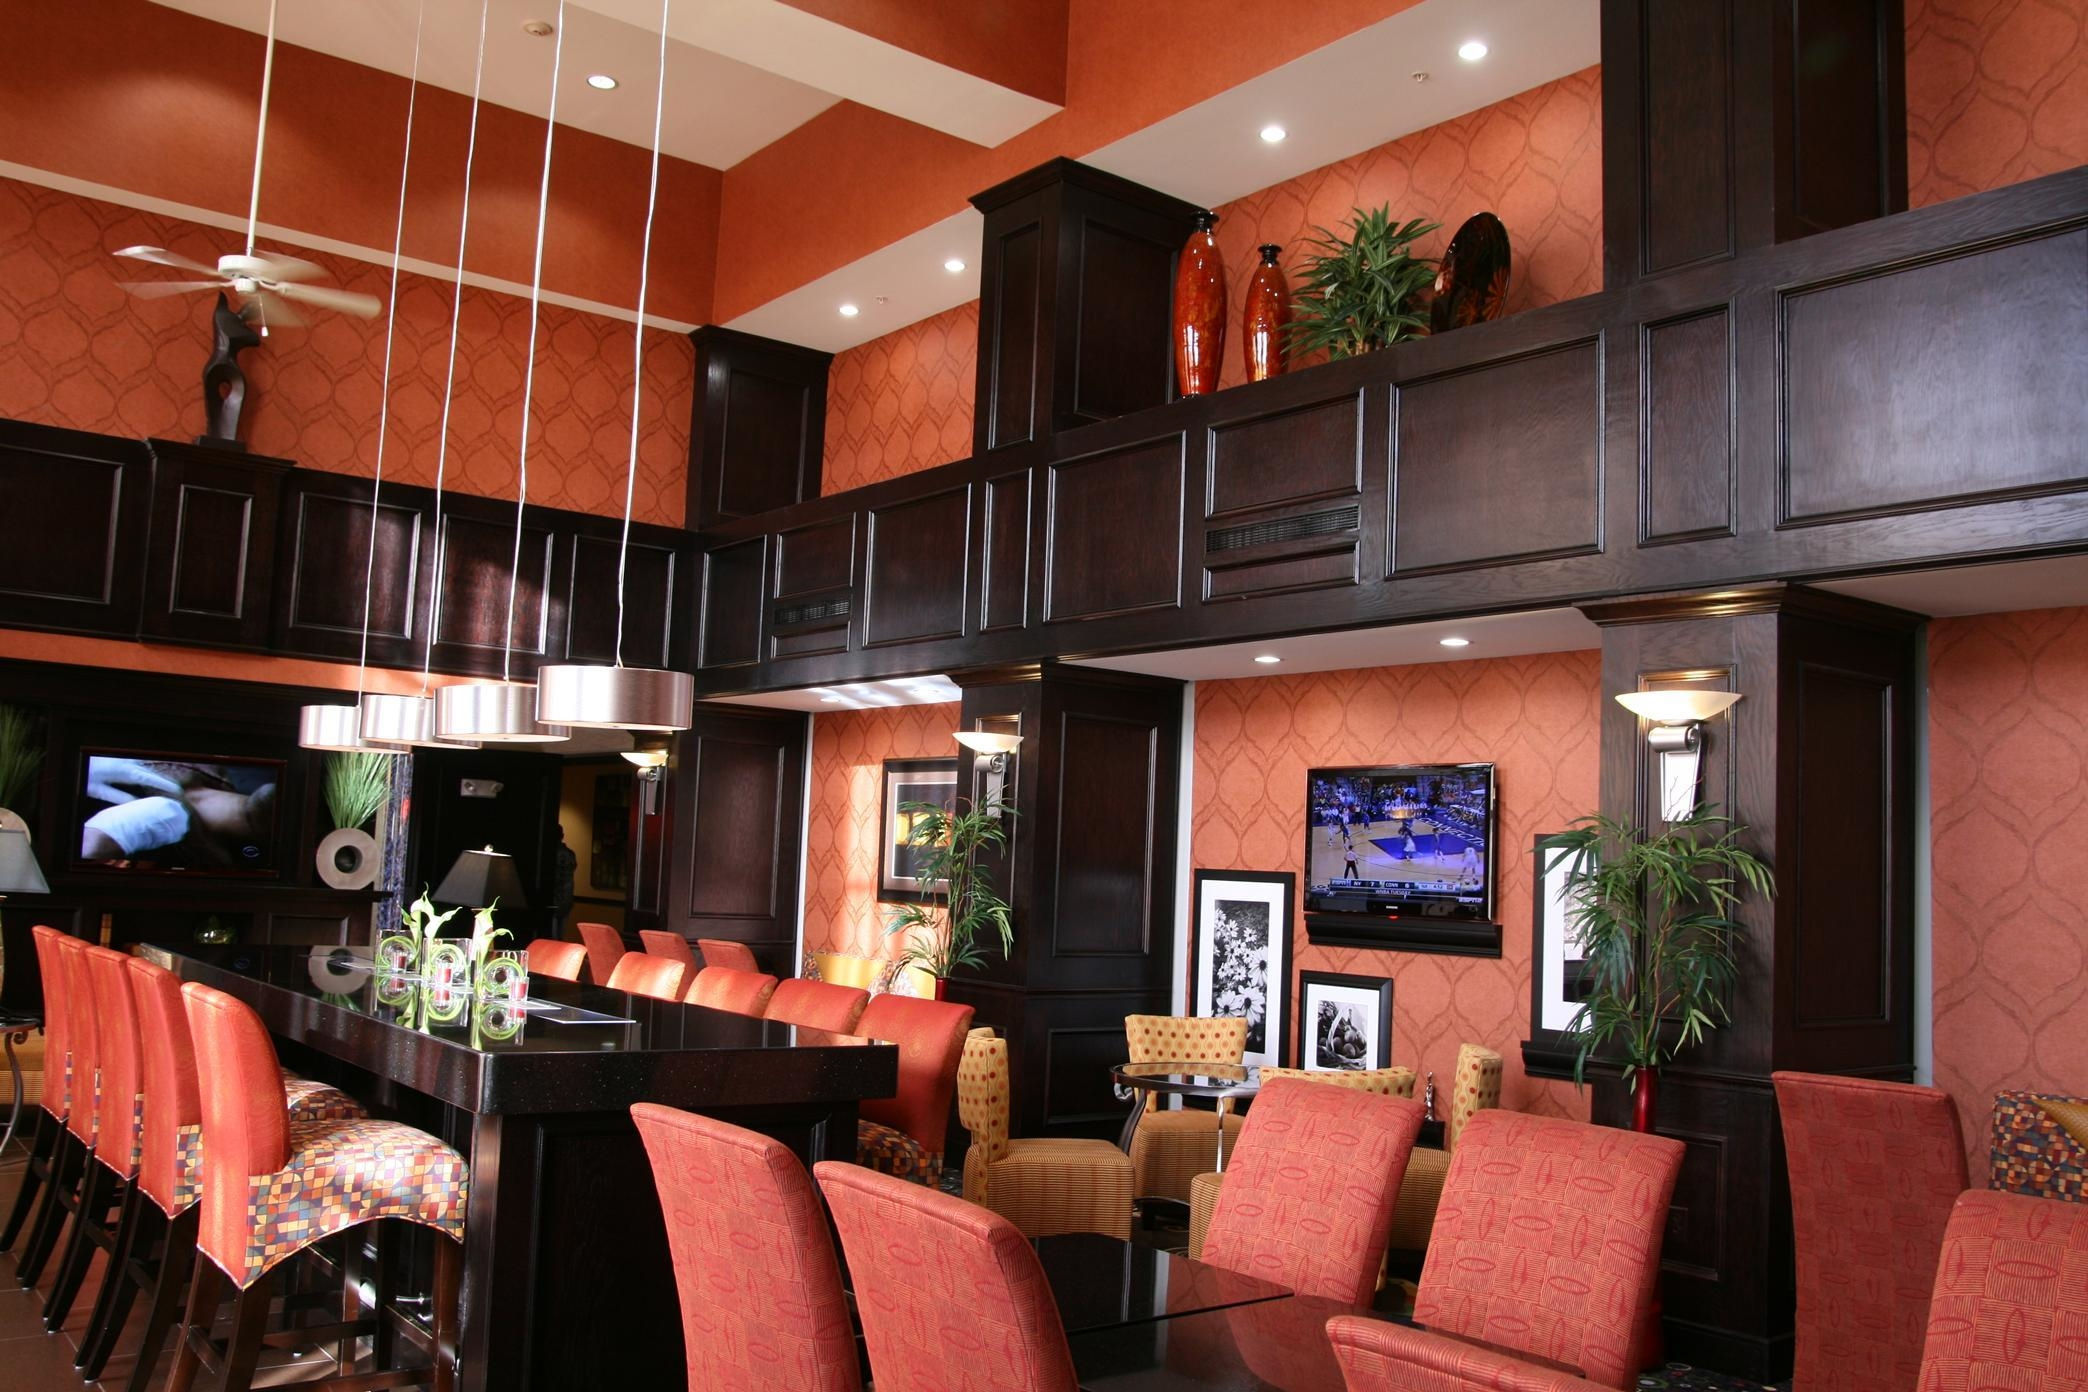 Hampton Inn & Suites Dallas/Lewisville-Vista Ridge Mall, TX image 10